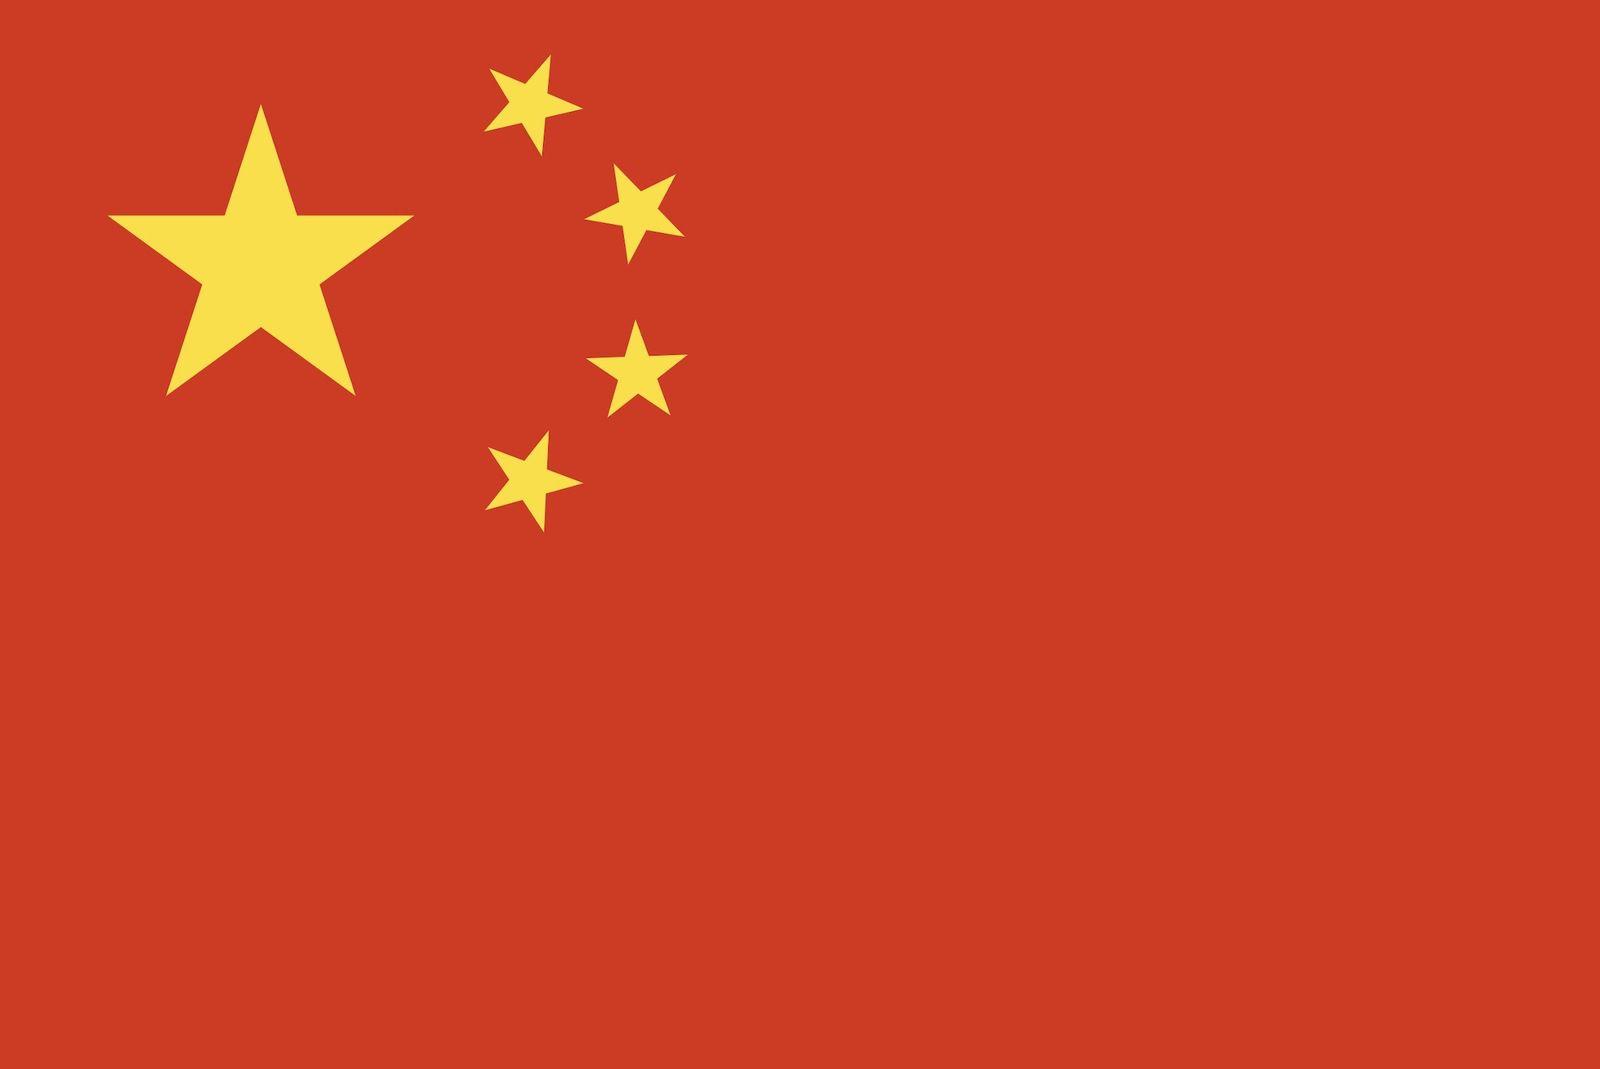 Andrei Fursov : diapositives en chinois (Club d'Izborsk, 28 mai 2020)